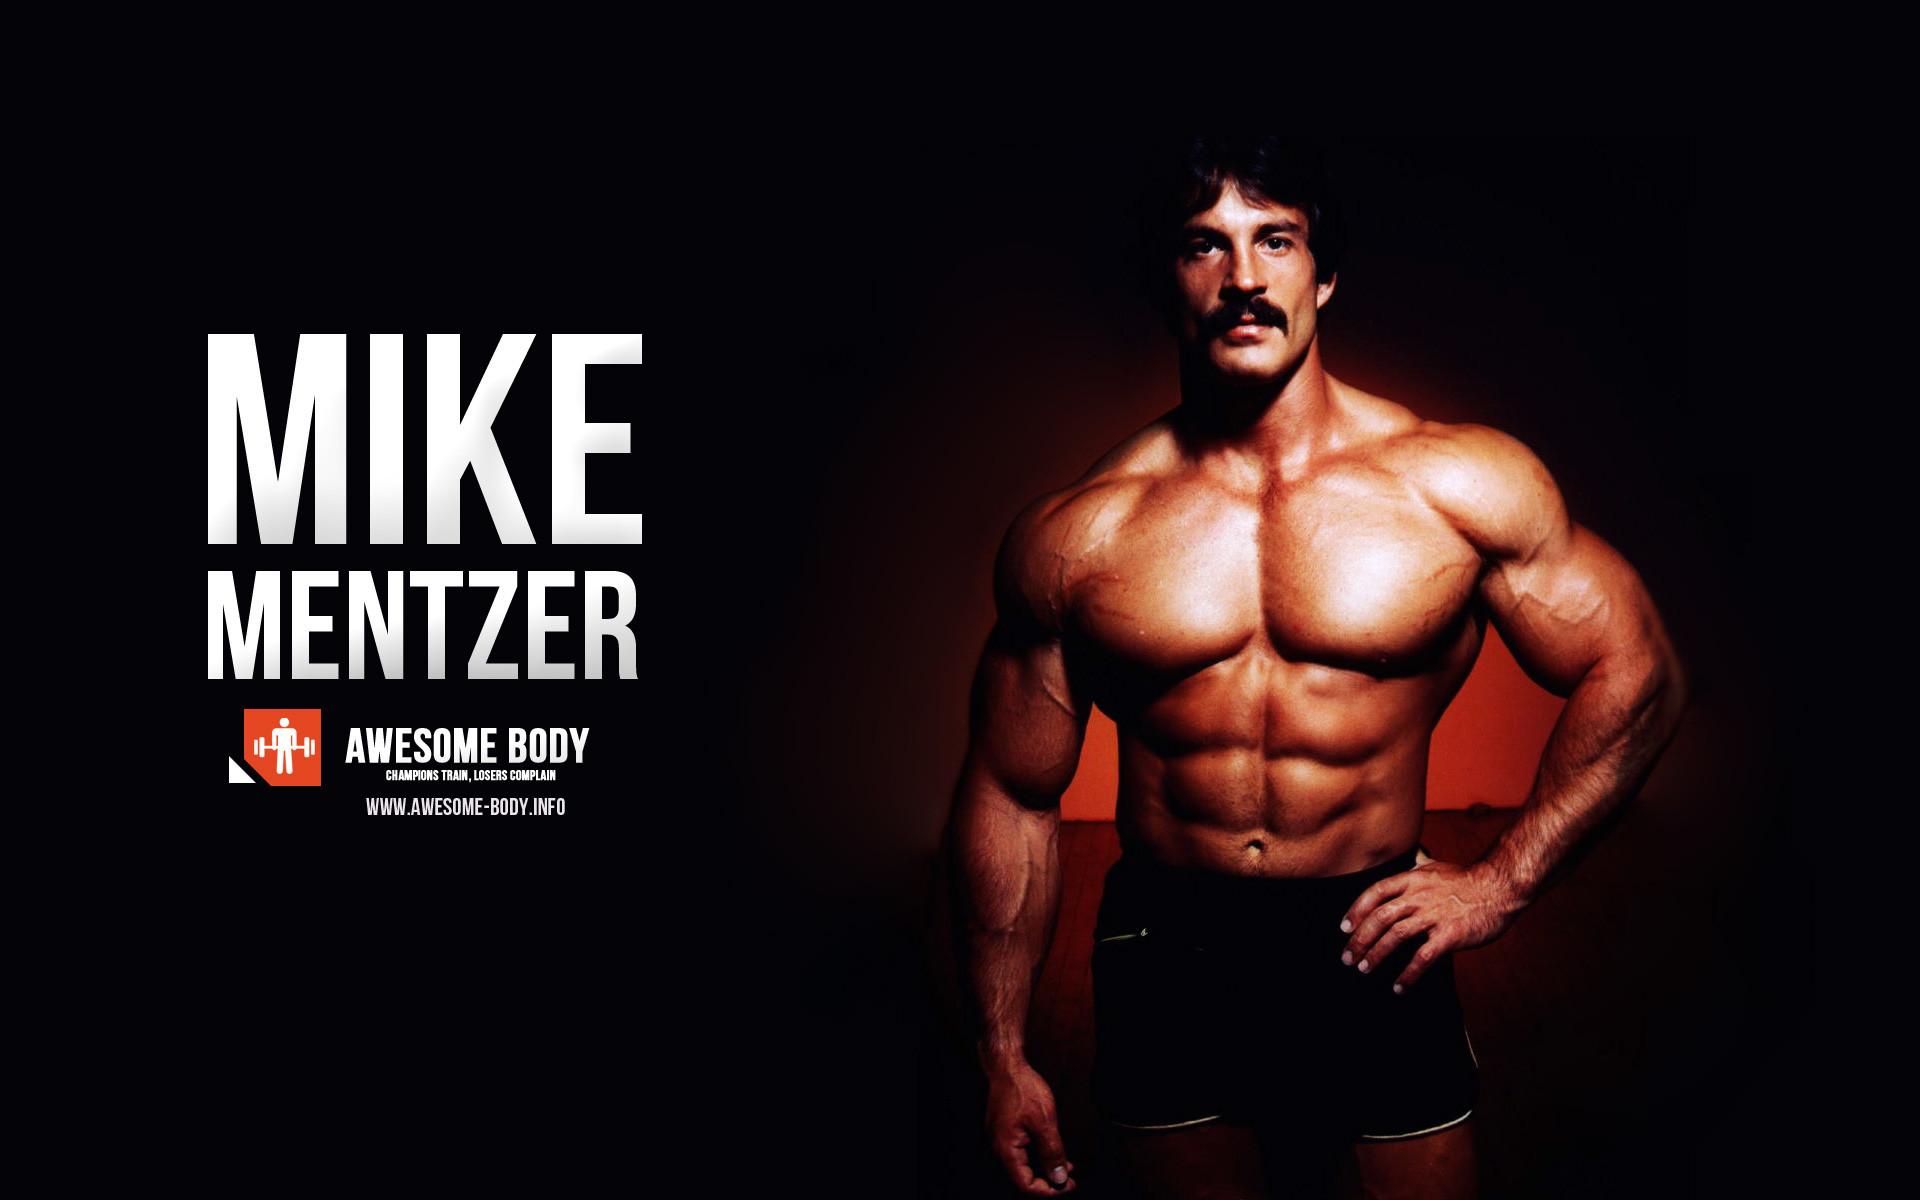 Arnold Schwarzenegger Bodybuilding Wallpapers Posters and